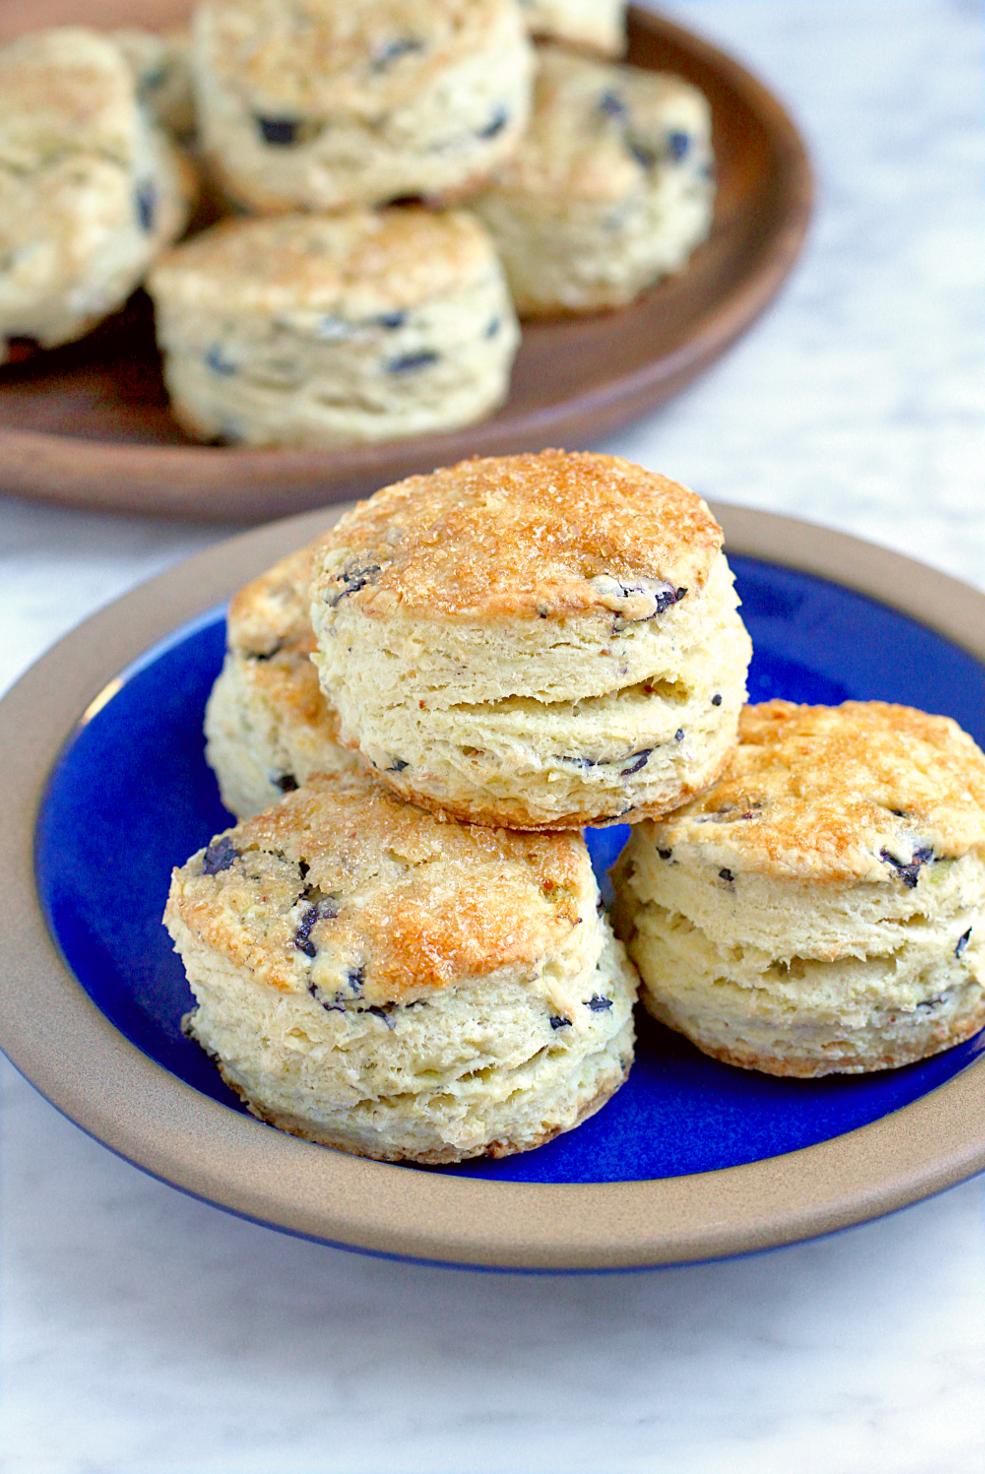 Image of blueberry coconut cream scones.